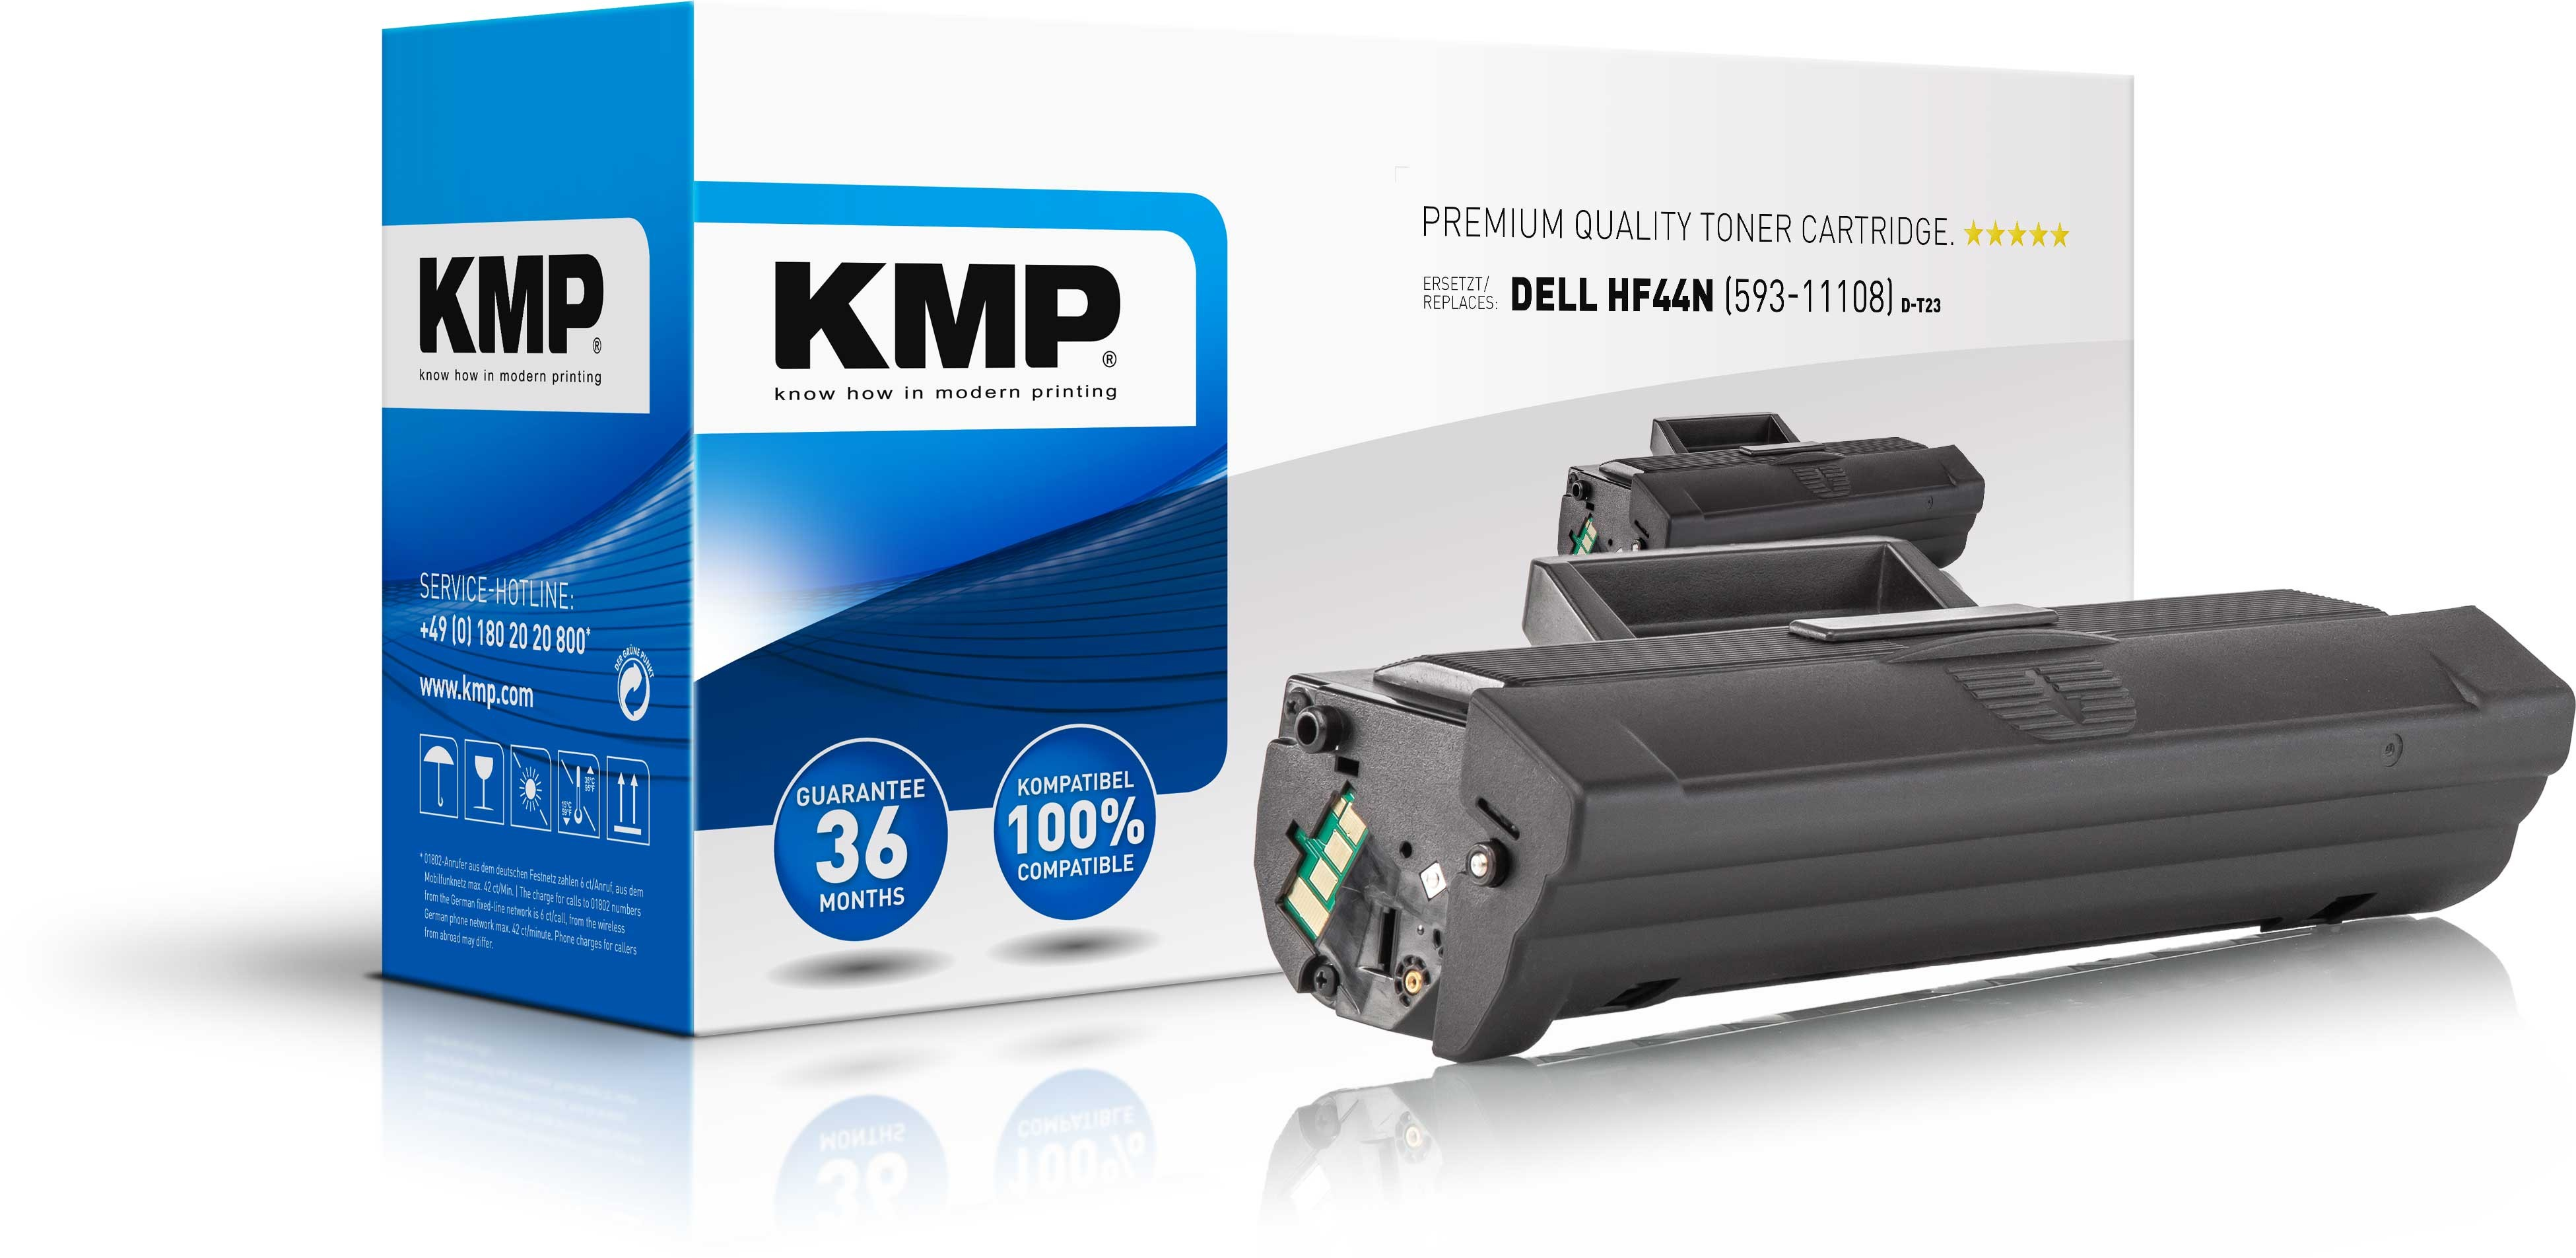 KMP Toner D-T23 ersetzt HF44N 593-11108 für Dell B1100 Series etc. black